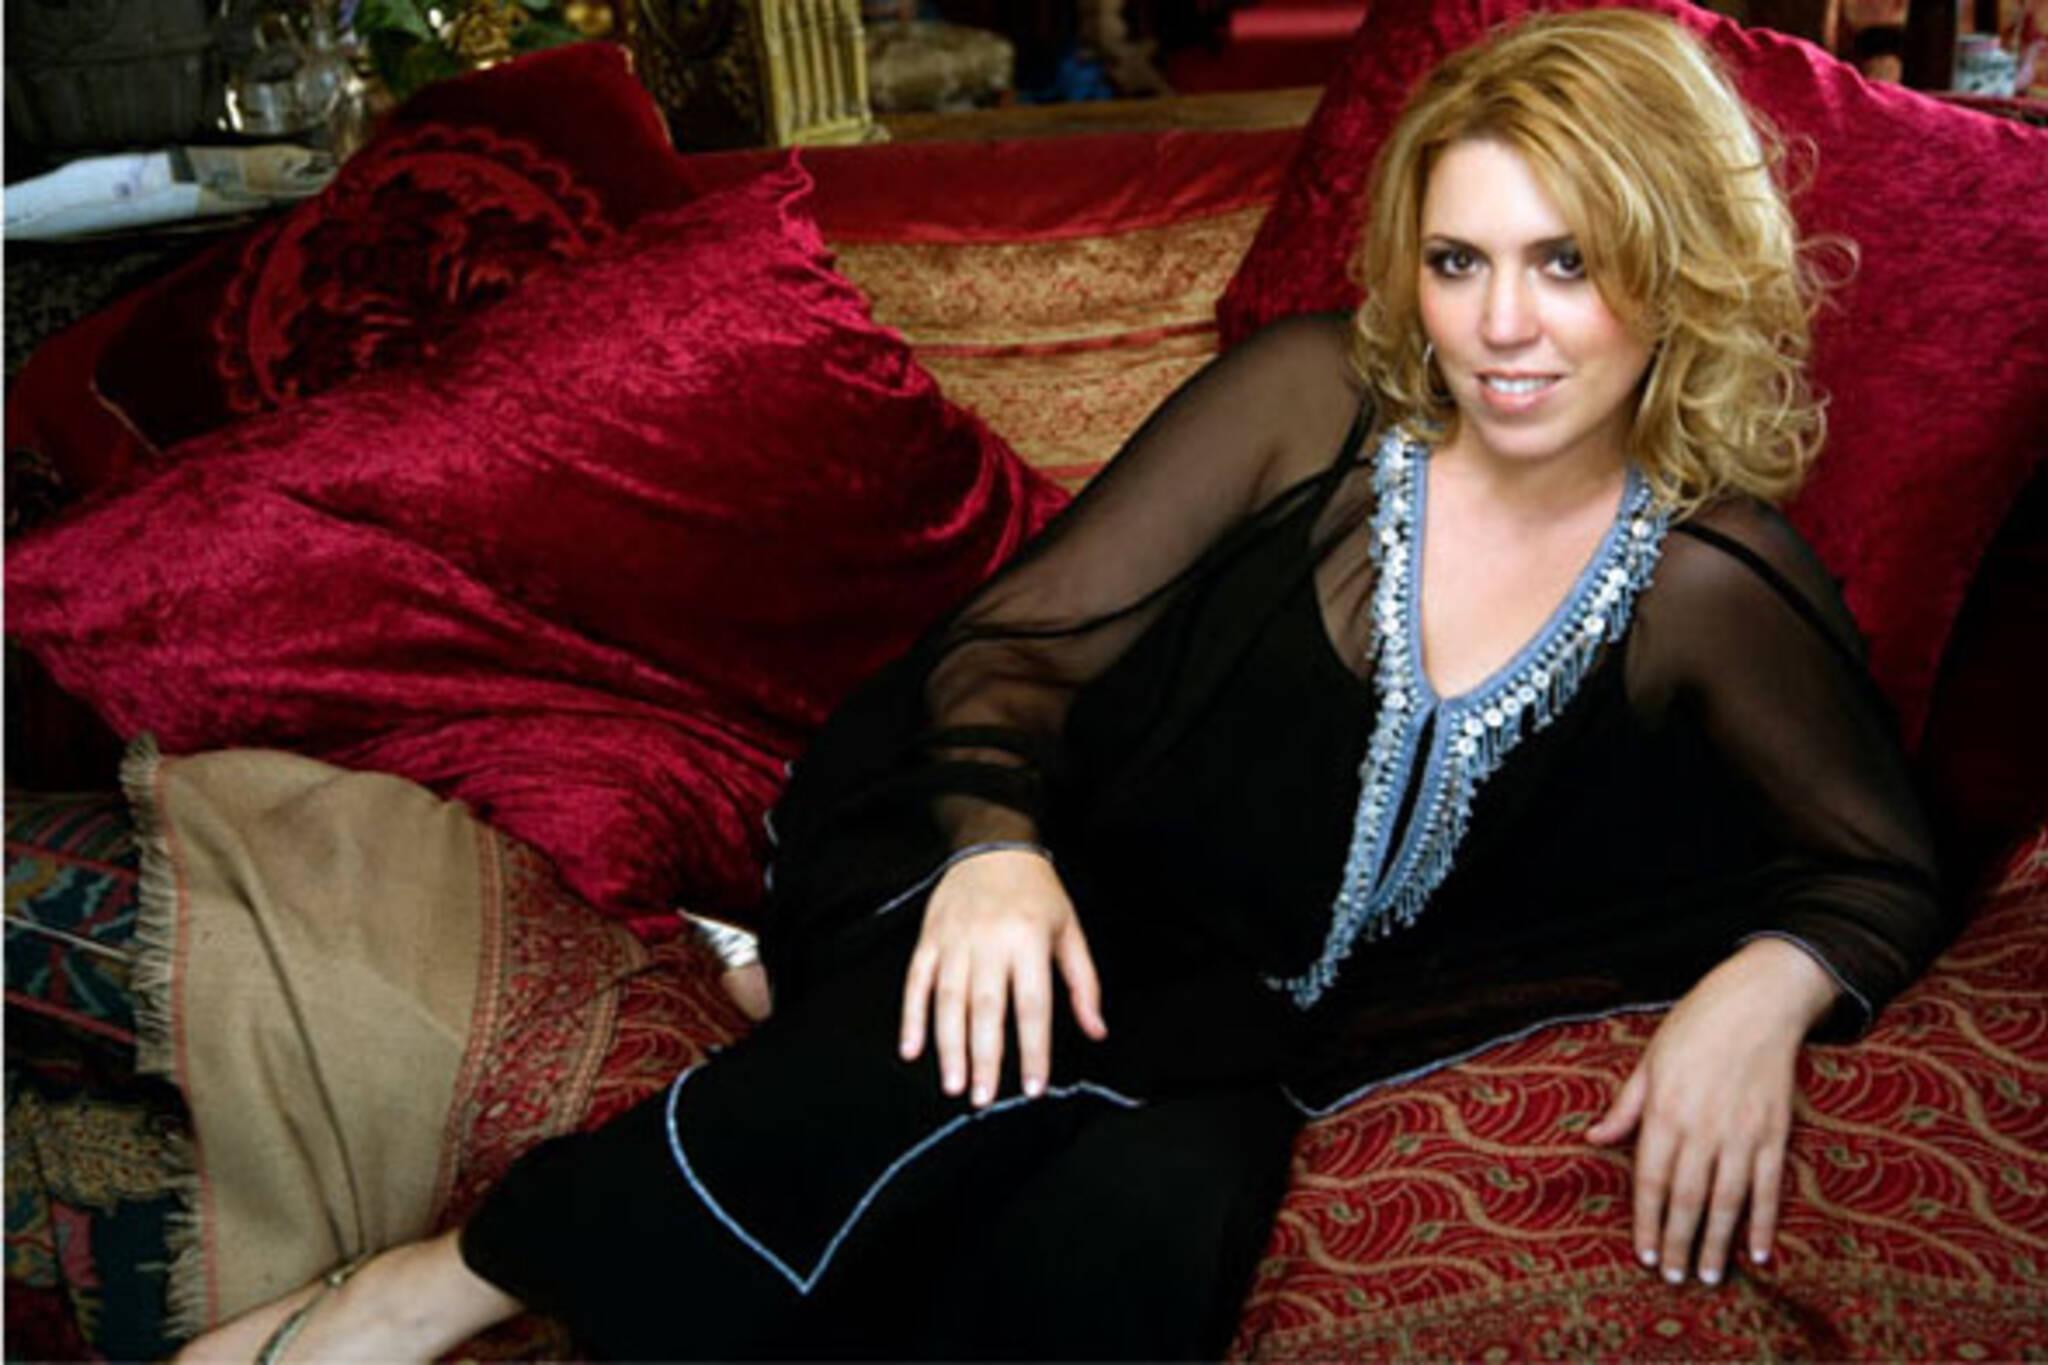 Pianist Gabriela Montero